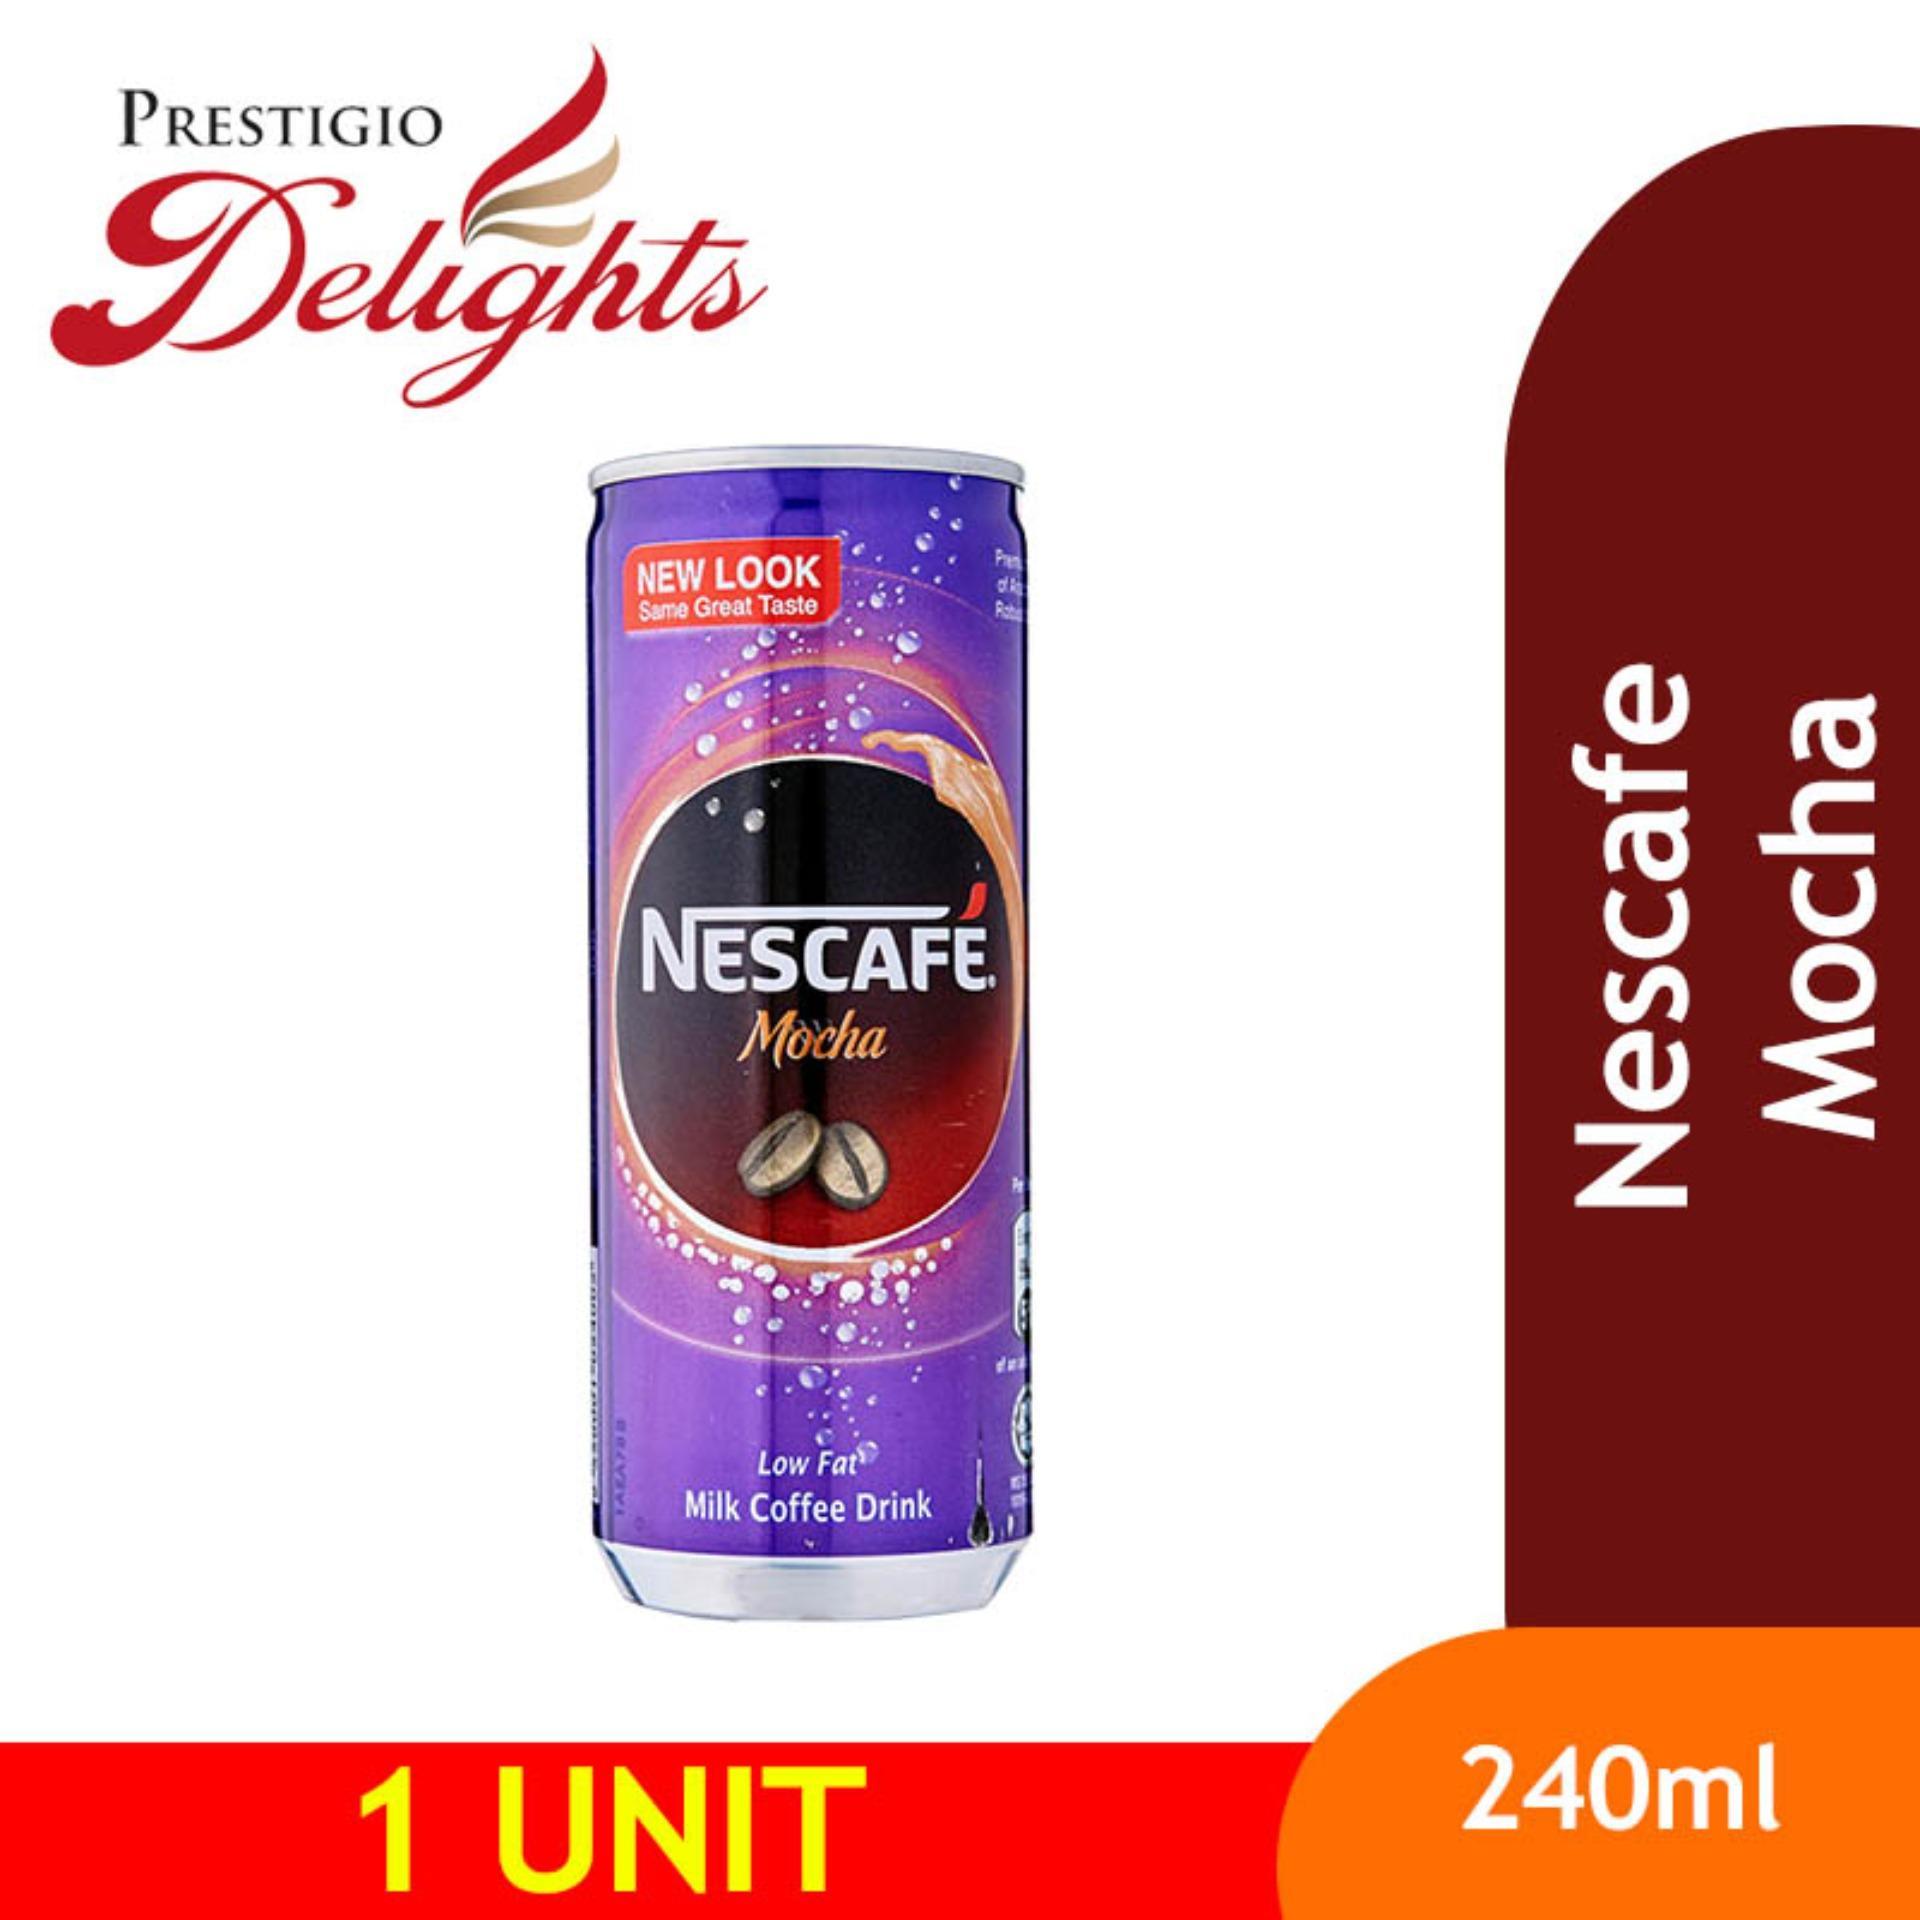 Nescafe Mocha 240ml By Prestigio Delights.